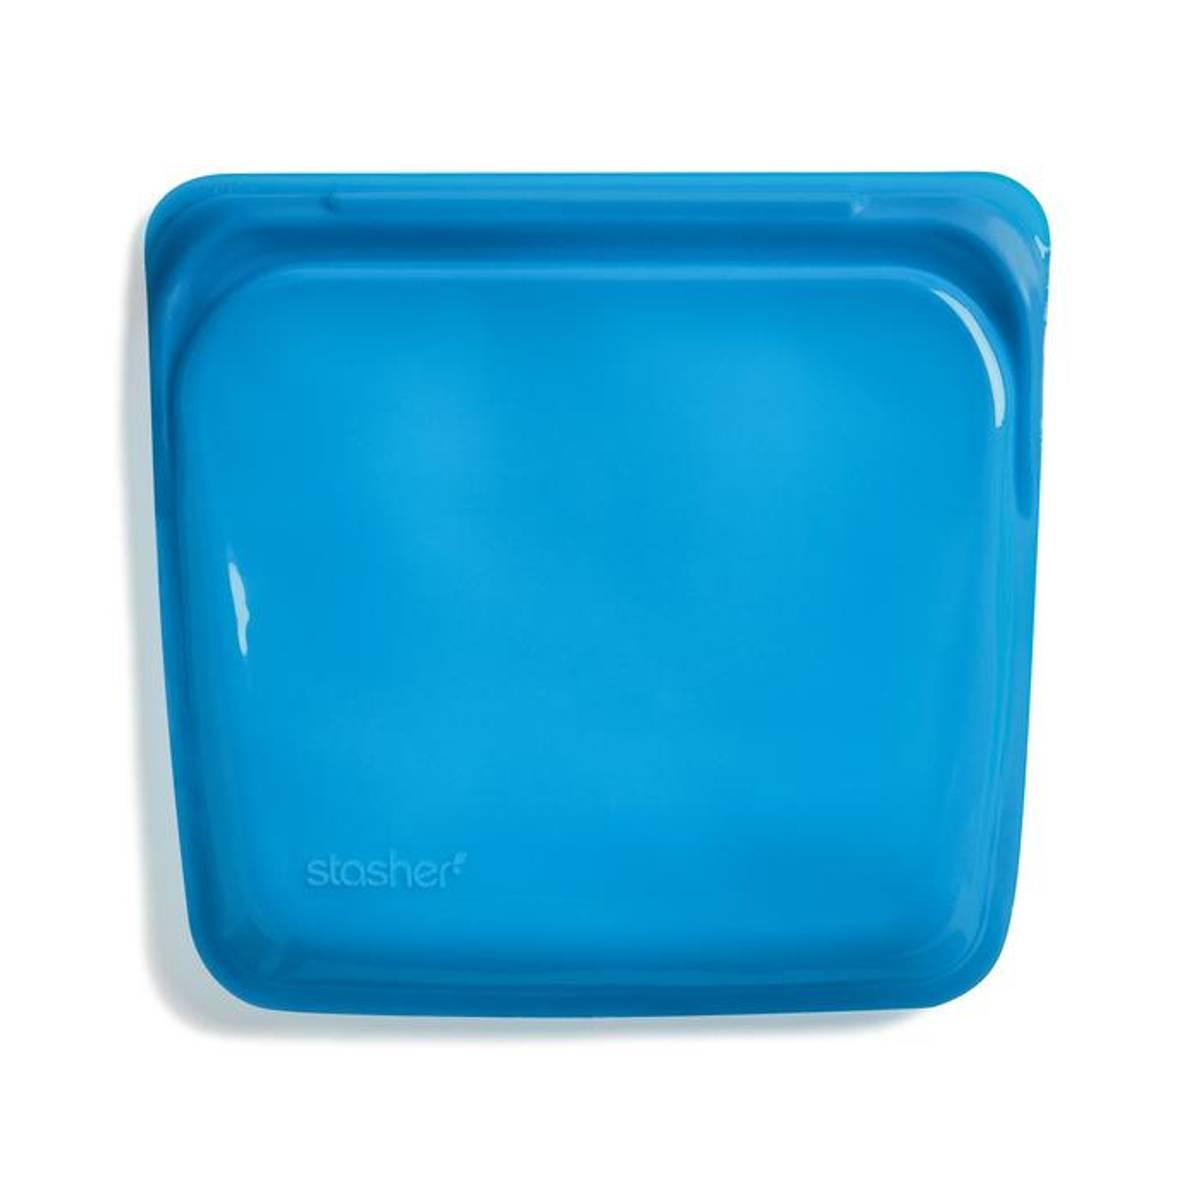 Stasher Sandwich, Blueberry / Stasher Bags